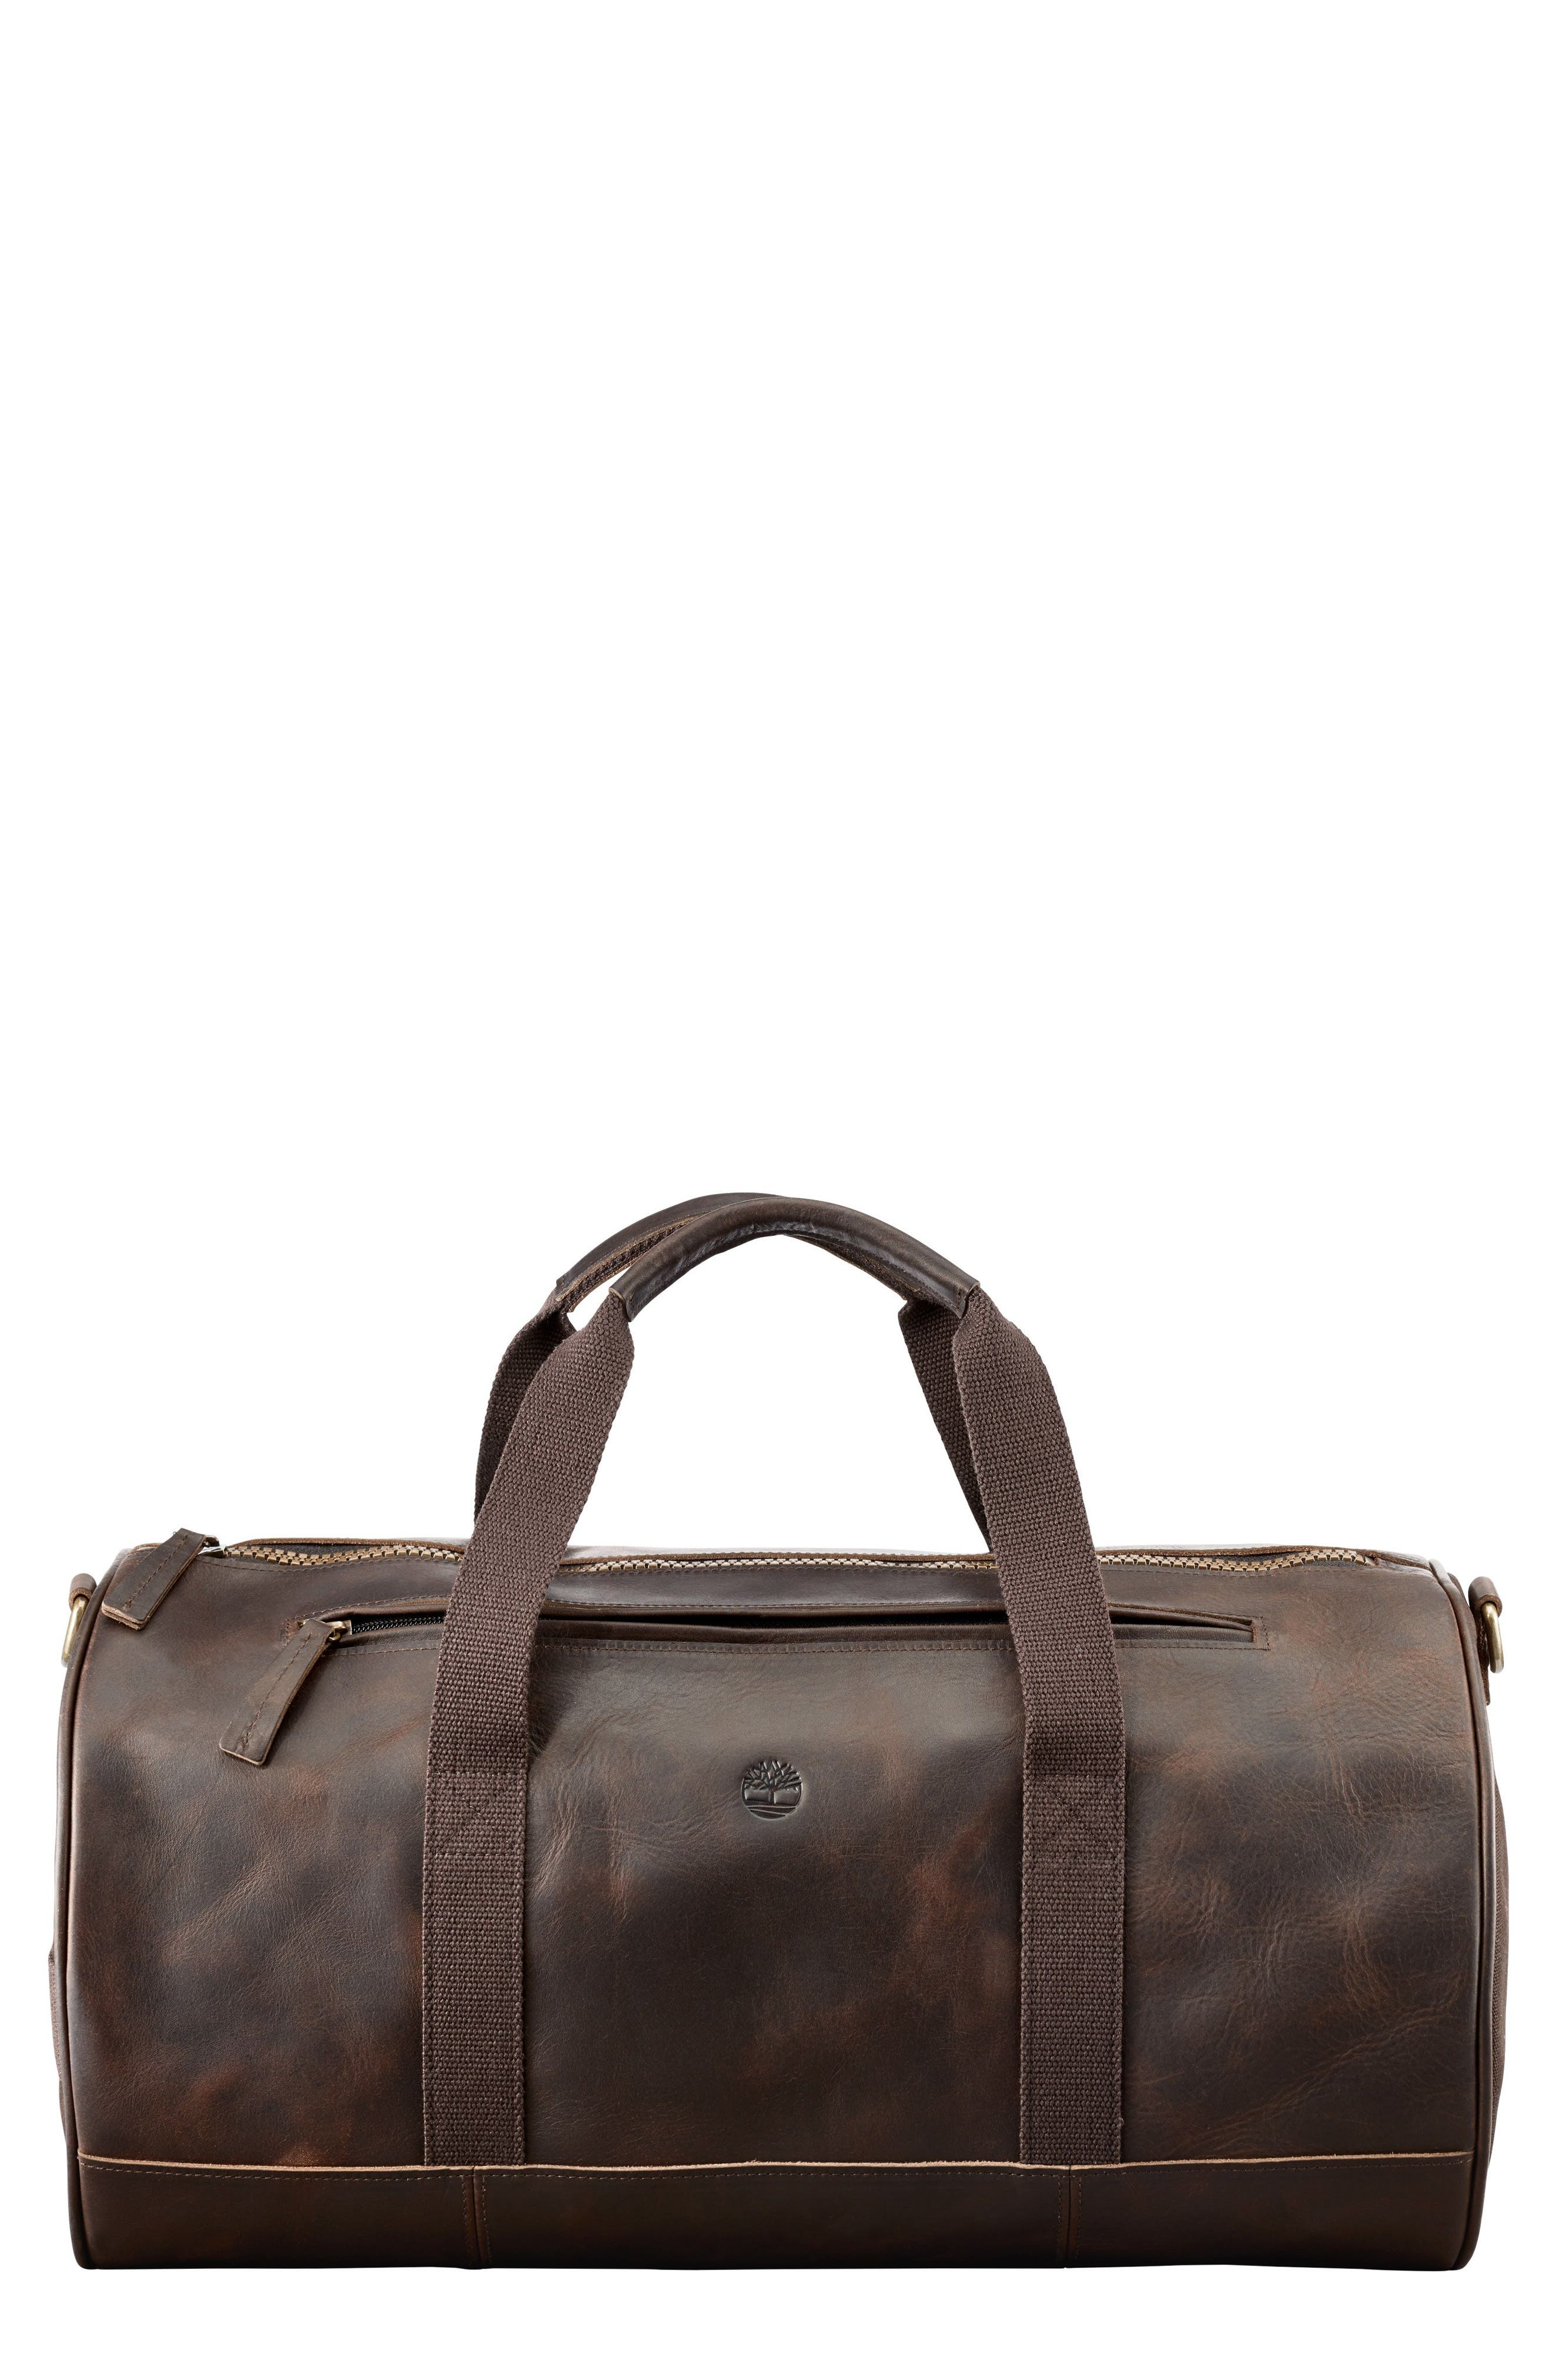 Timberland Tuckerman Leather Duffel